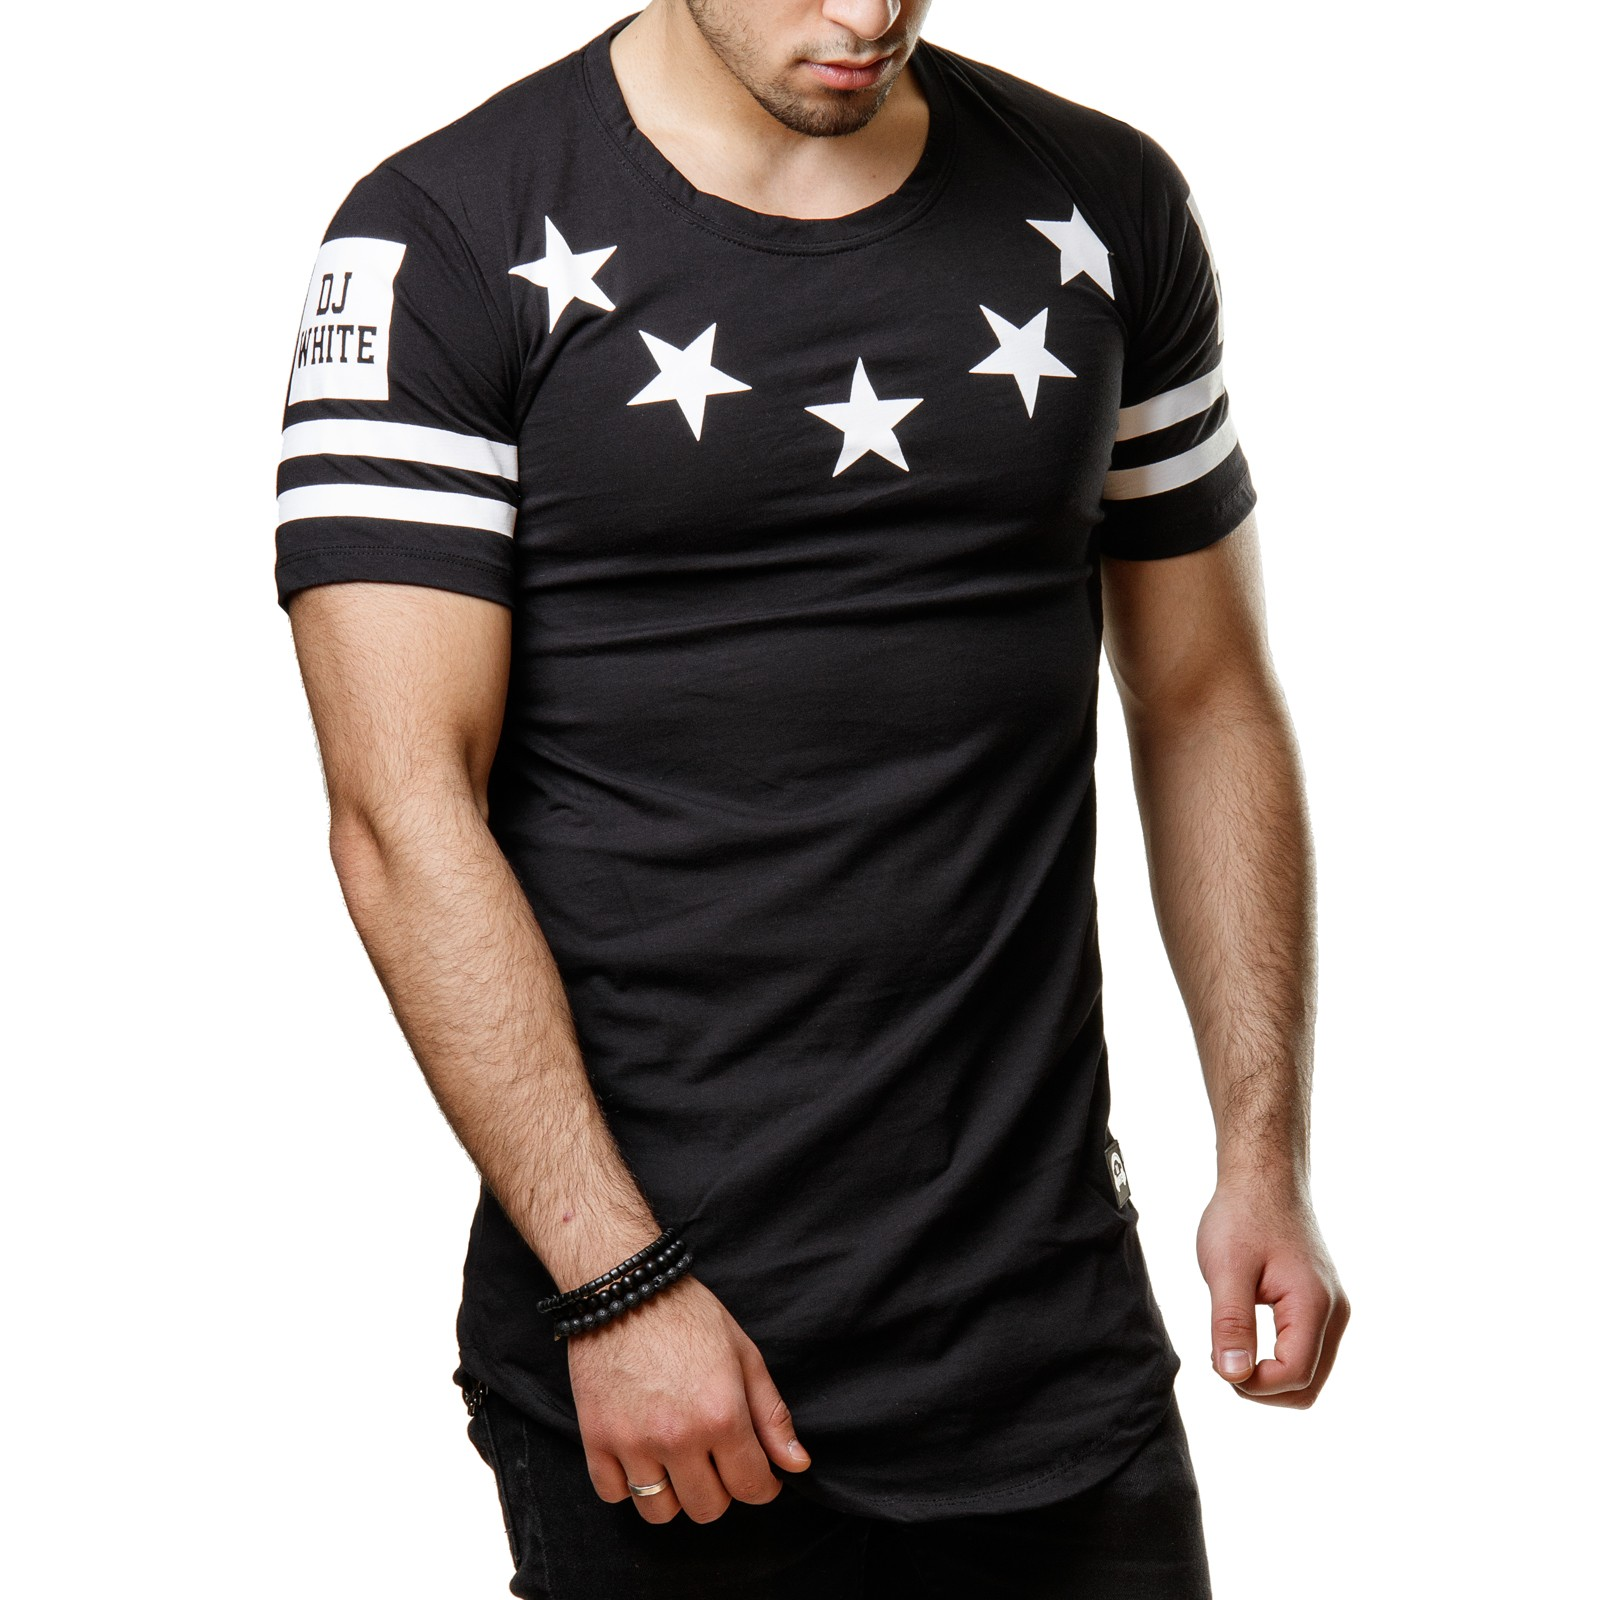 dj white 162002 herren t shirt berlin star camouflage oversize long shirt s xl. Black Bedroom Furniture Sets. Home Design Ideas